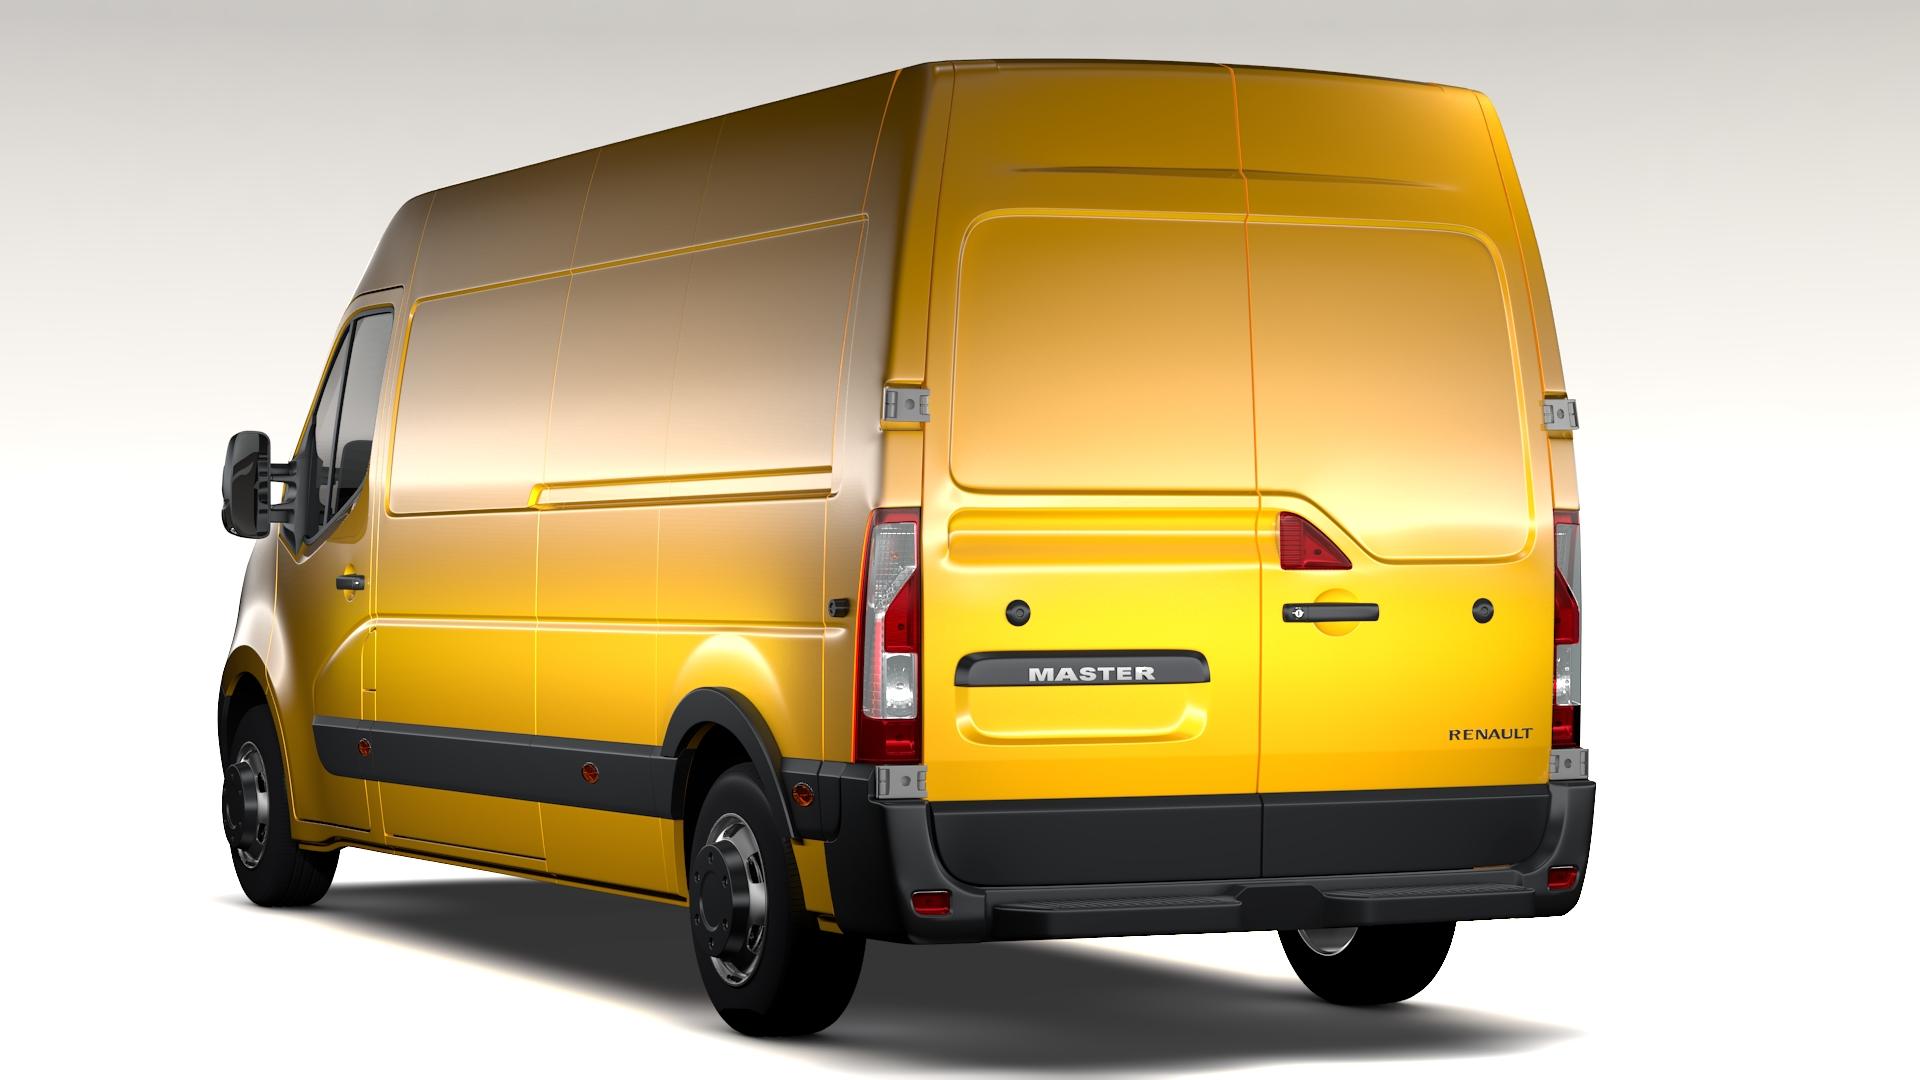 renault meistars l3h2 van 2010 3d modelis 3ds maks.